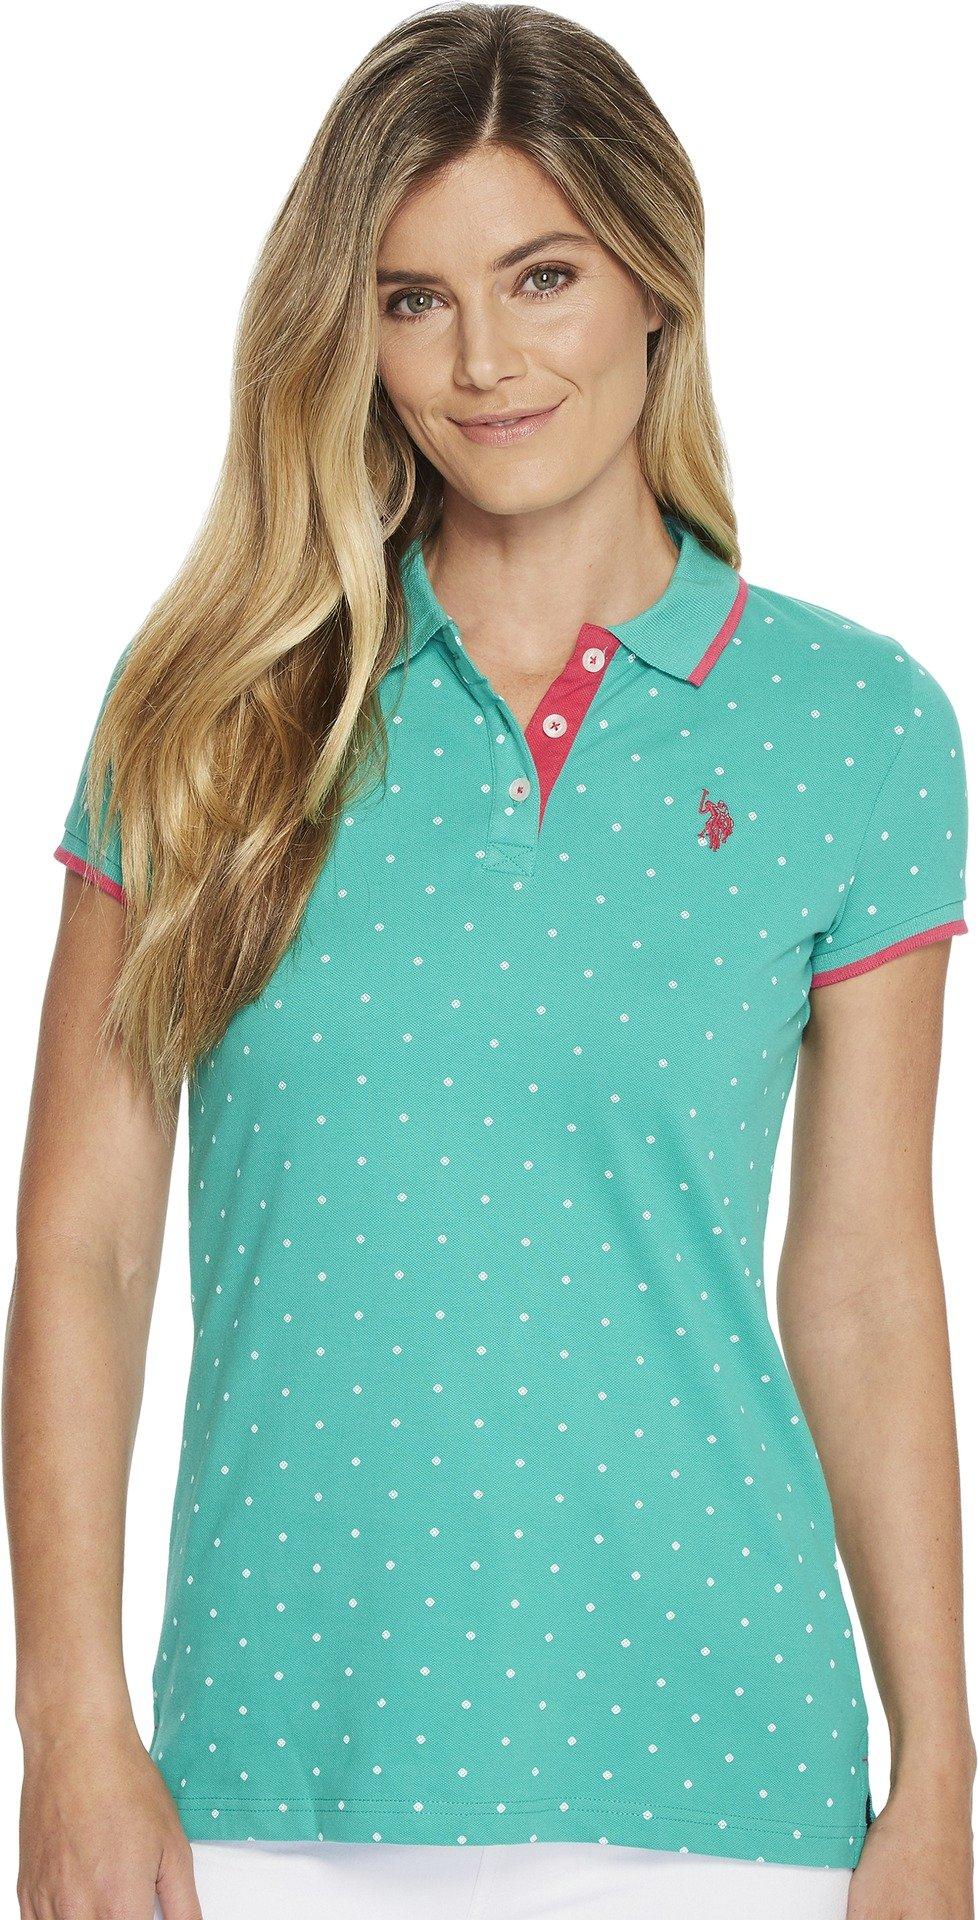 U.S. Polo Assn. Women's Short Sleeve Fashion Polo Shirt, Emerald Wave, S